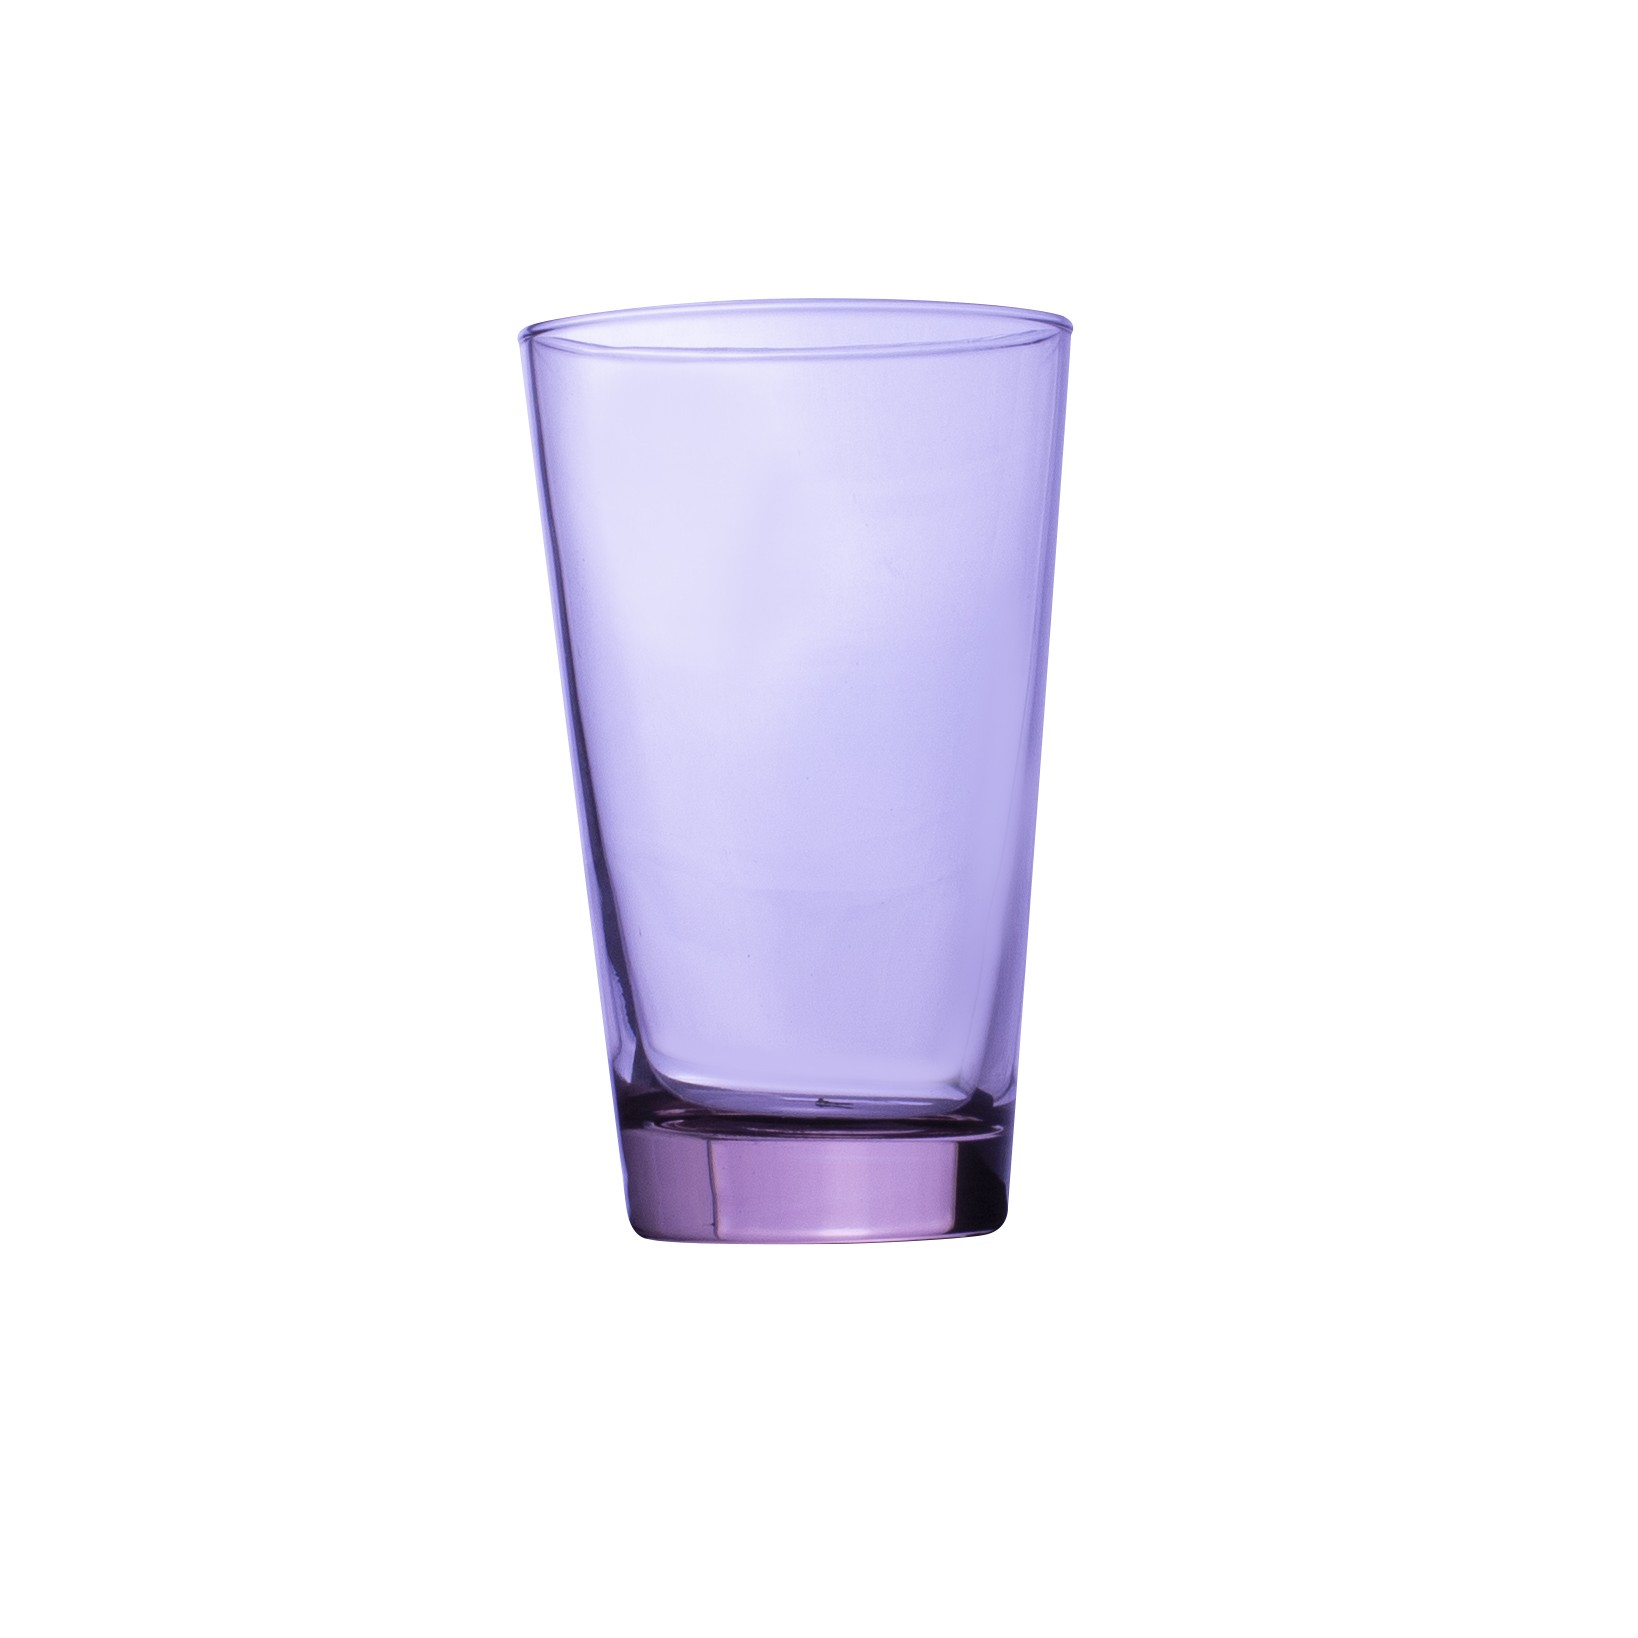 Copo Izmir 395ml de Vidro Transparente - Mypa